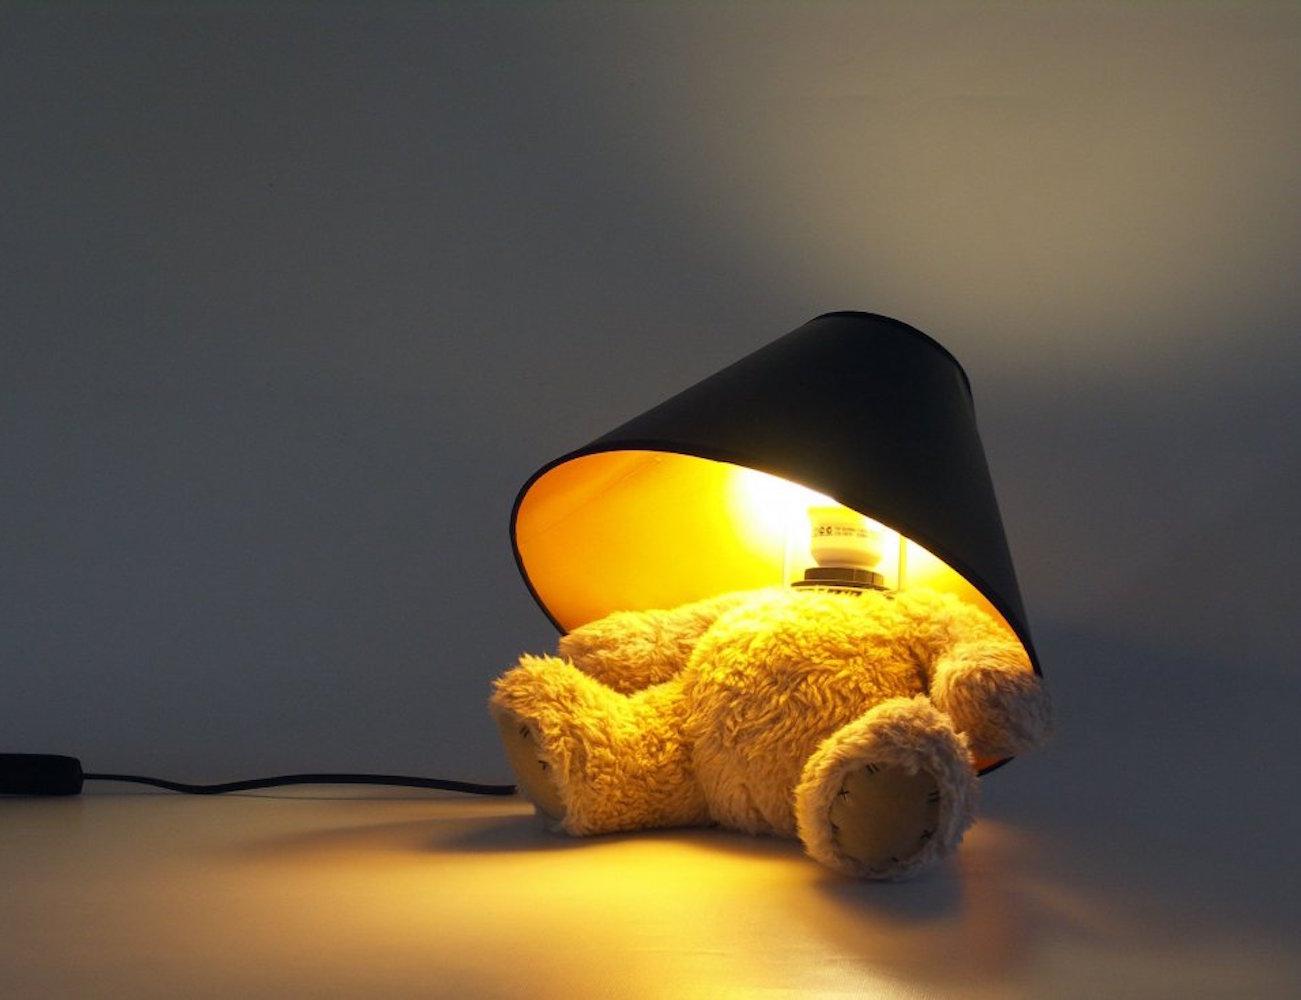 teddy-bear-lamp-from-suck-uk-new-02